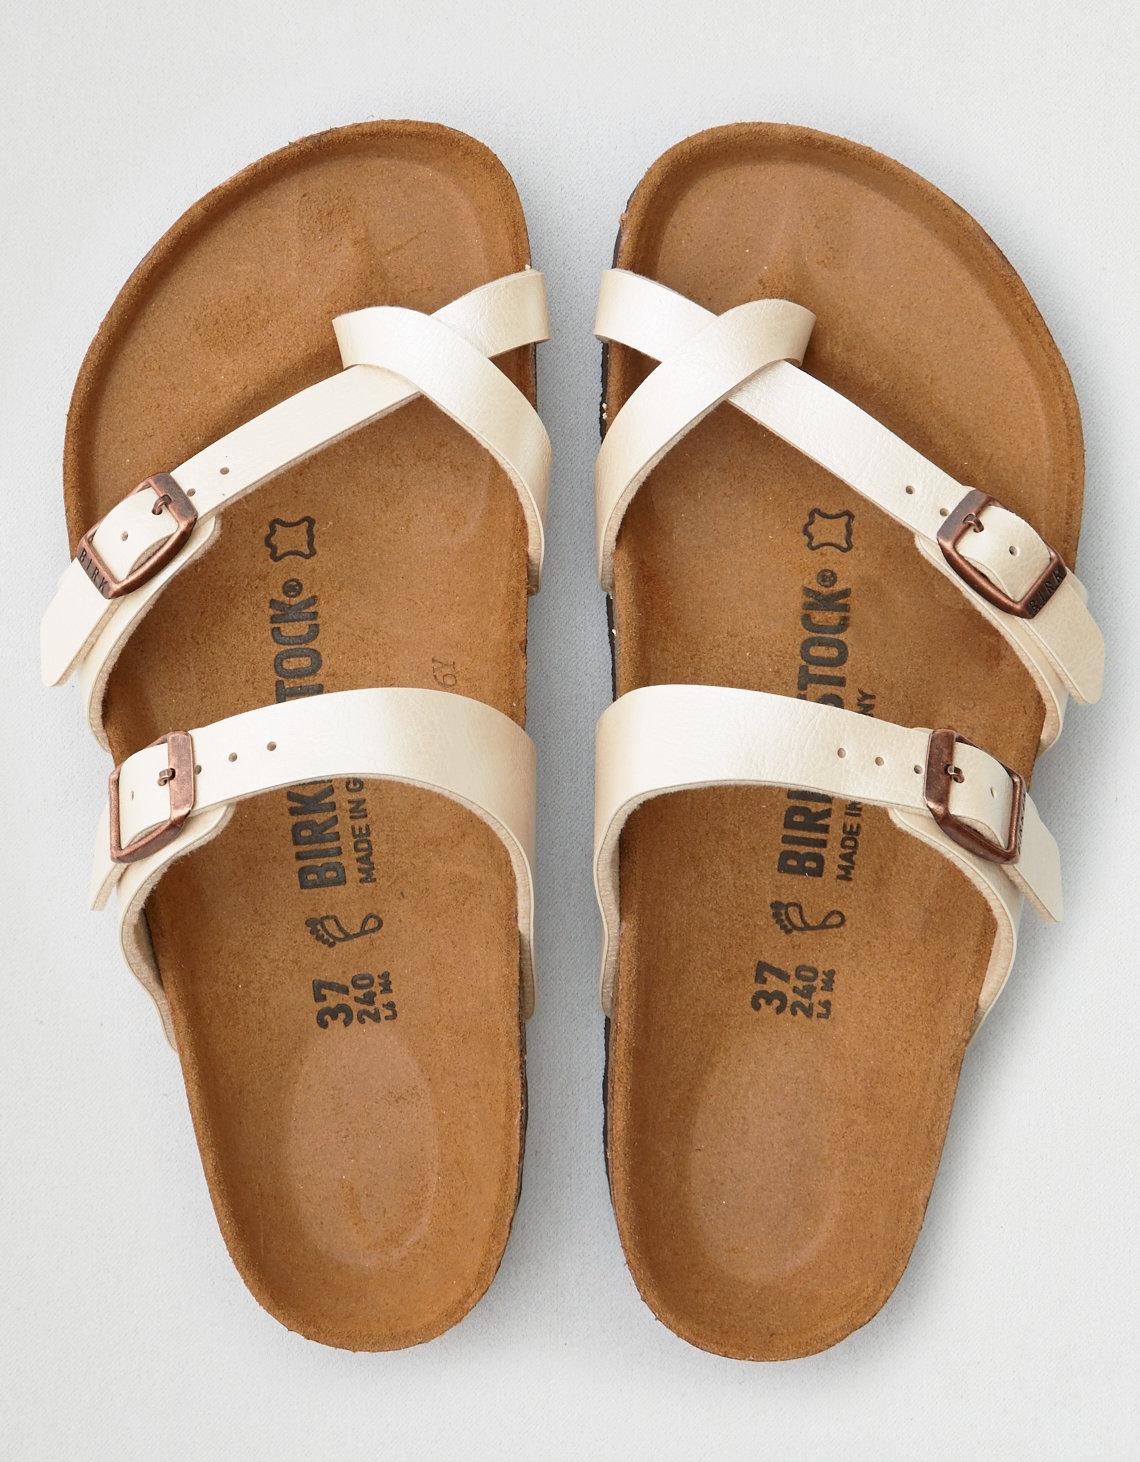 4db229134c2 Birkenstock Mayari Sandal. Placeholder image. Product Image